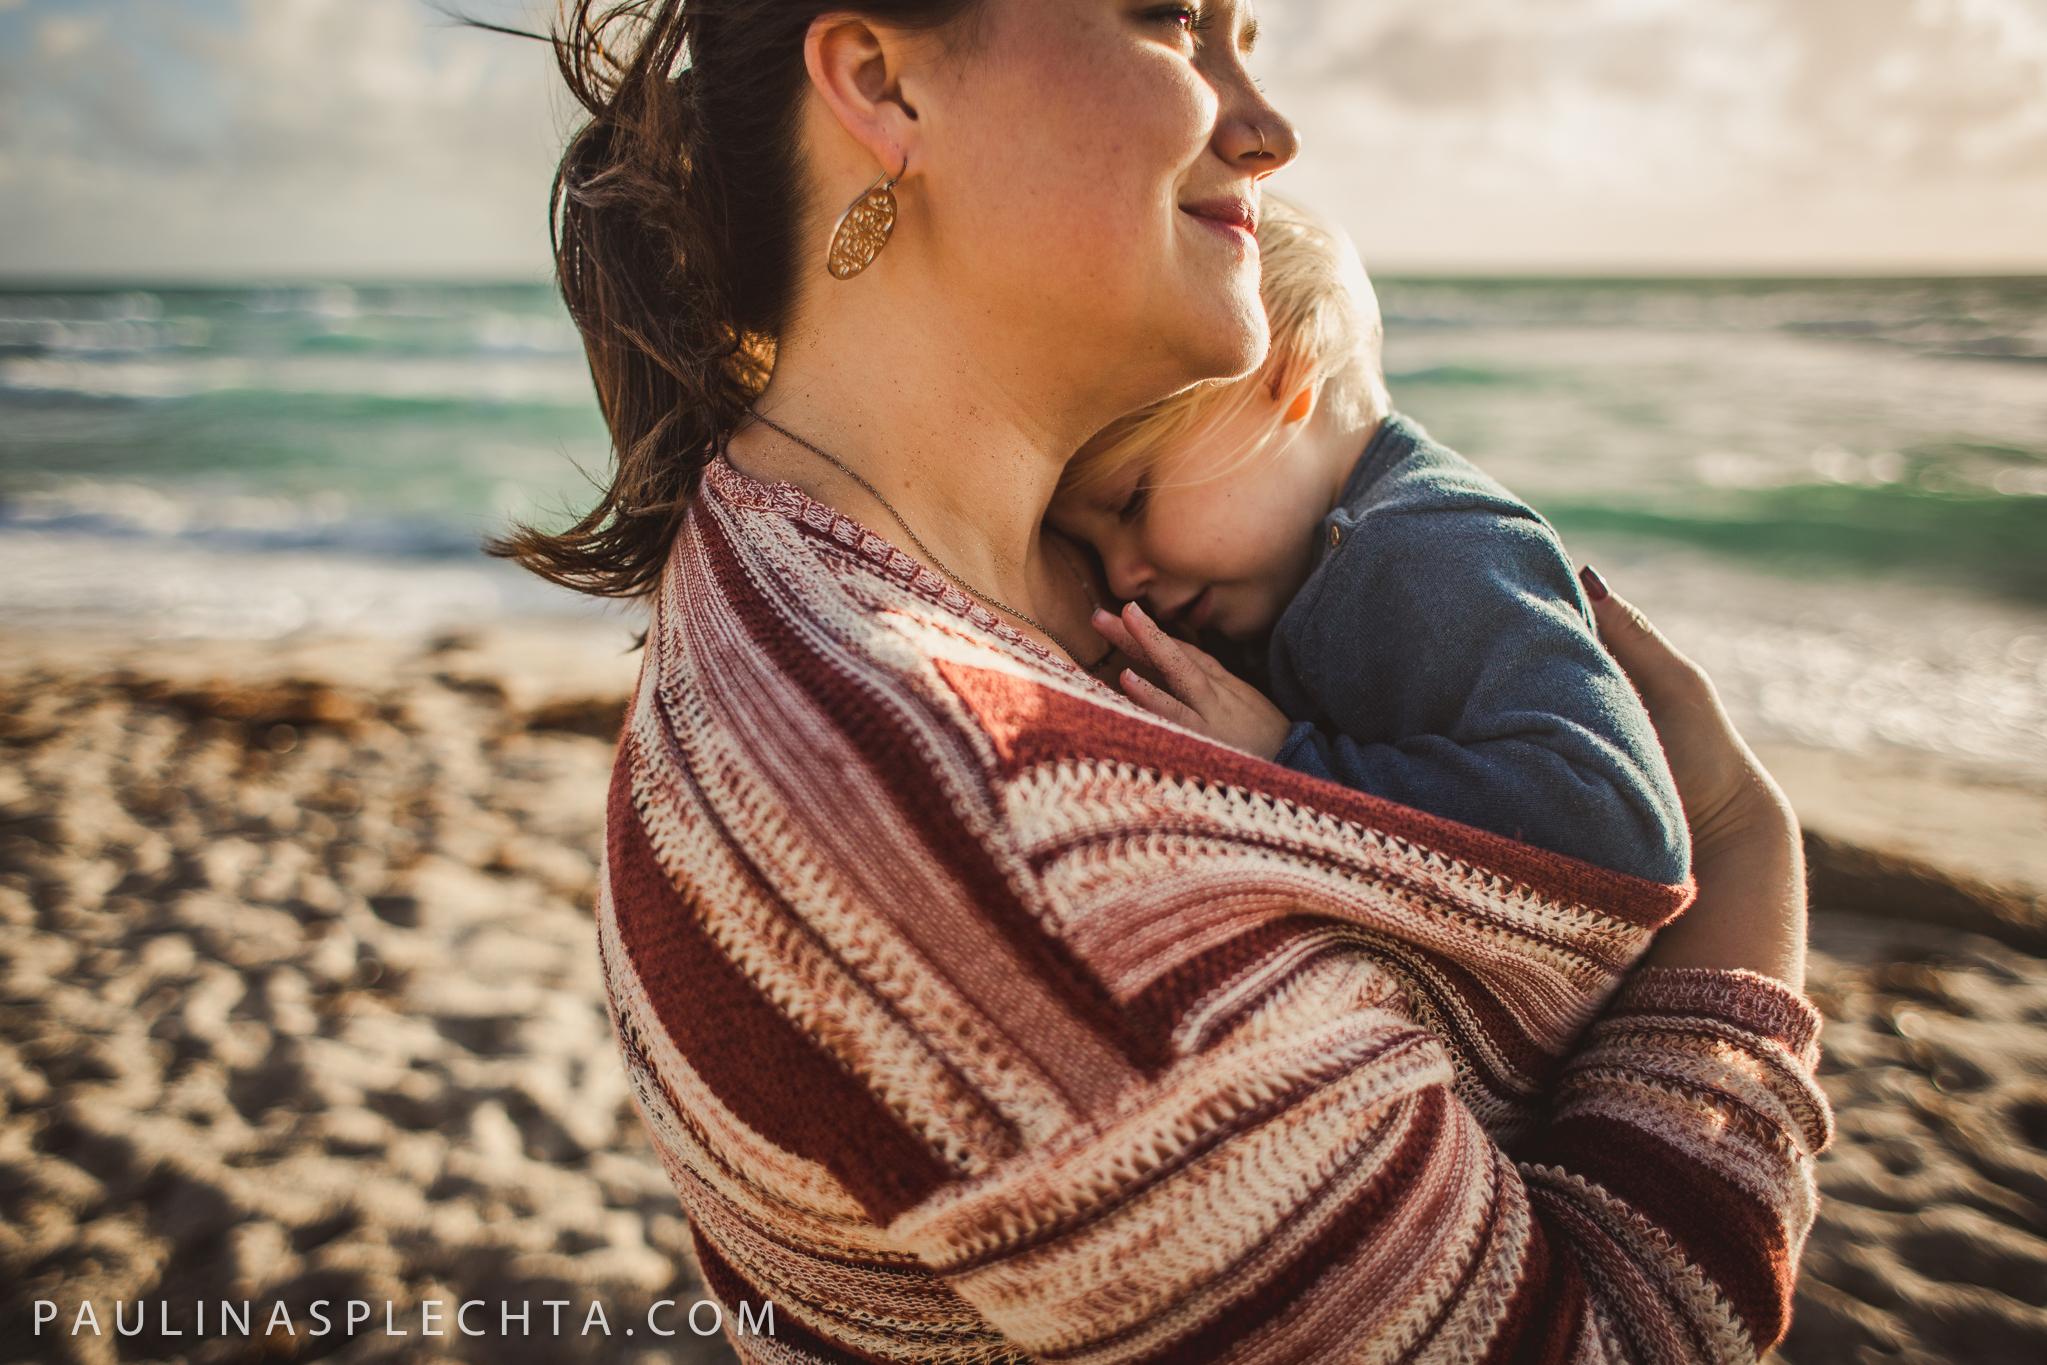 Family Photographer South Florida Pompano Broward Palm Beach Babies Baby Newborn Breastfeeding Birth Photograpy Beach Home Documentary Session-150.jpg